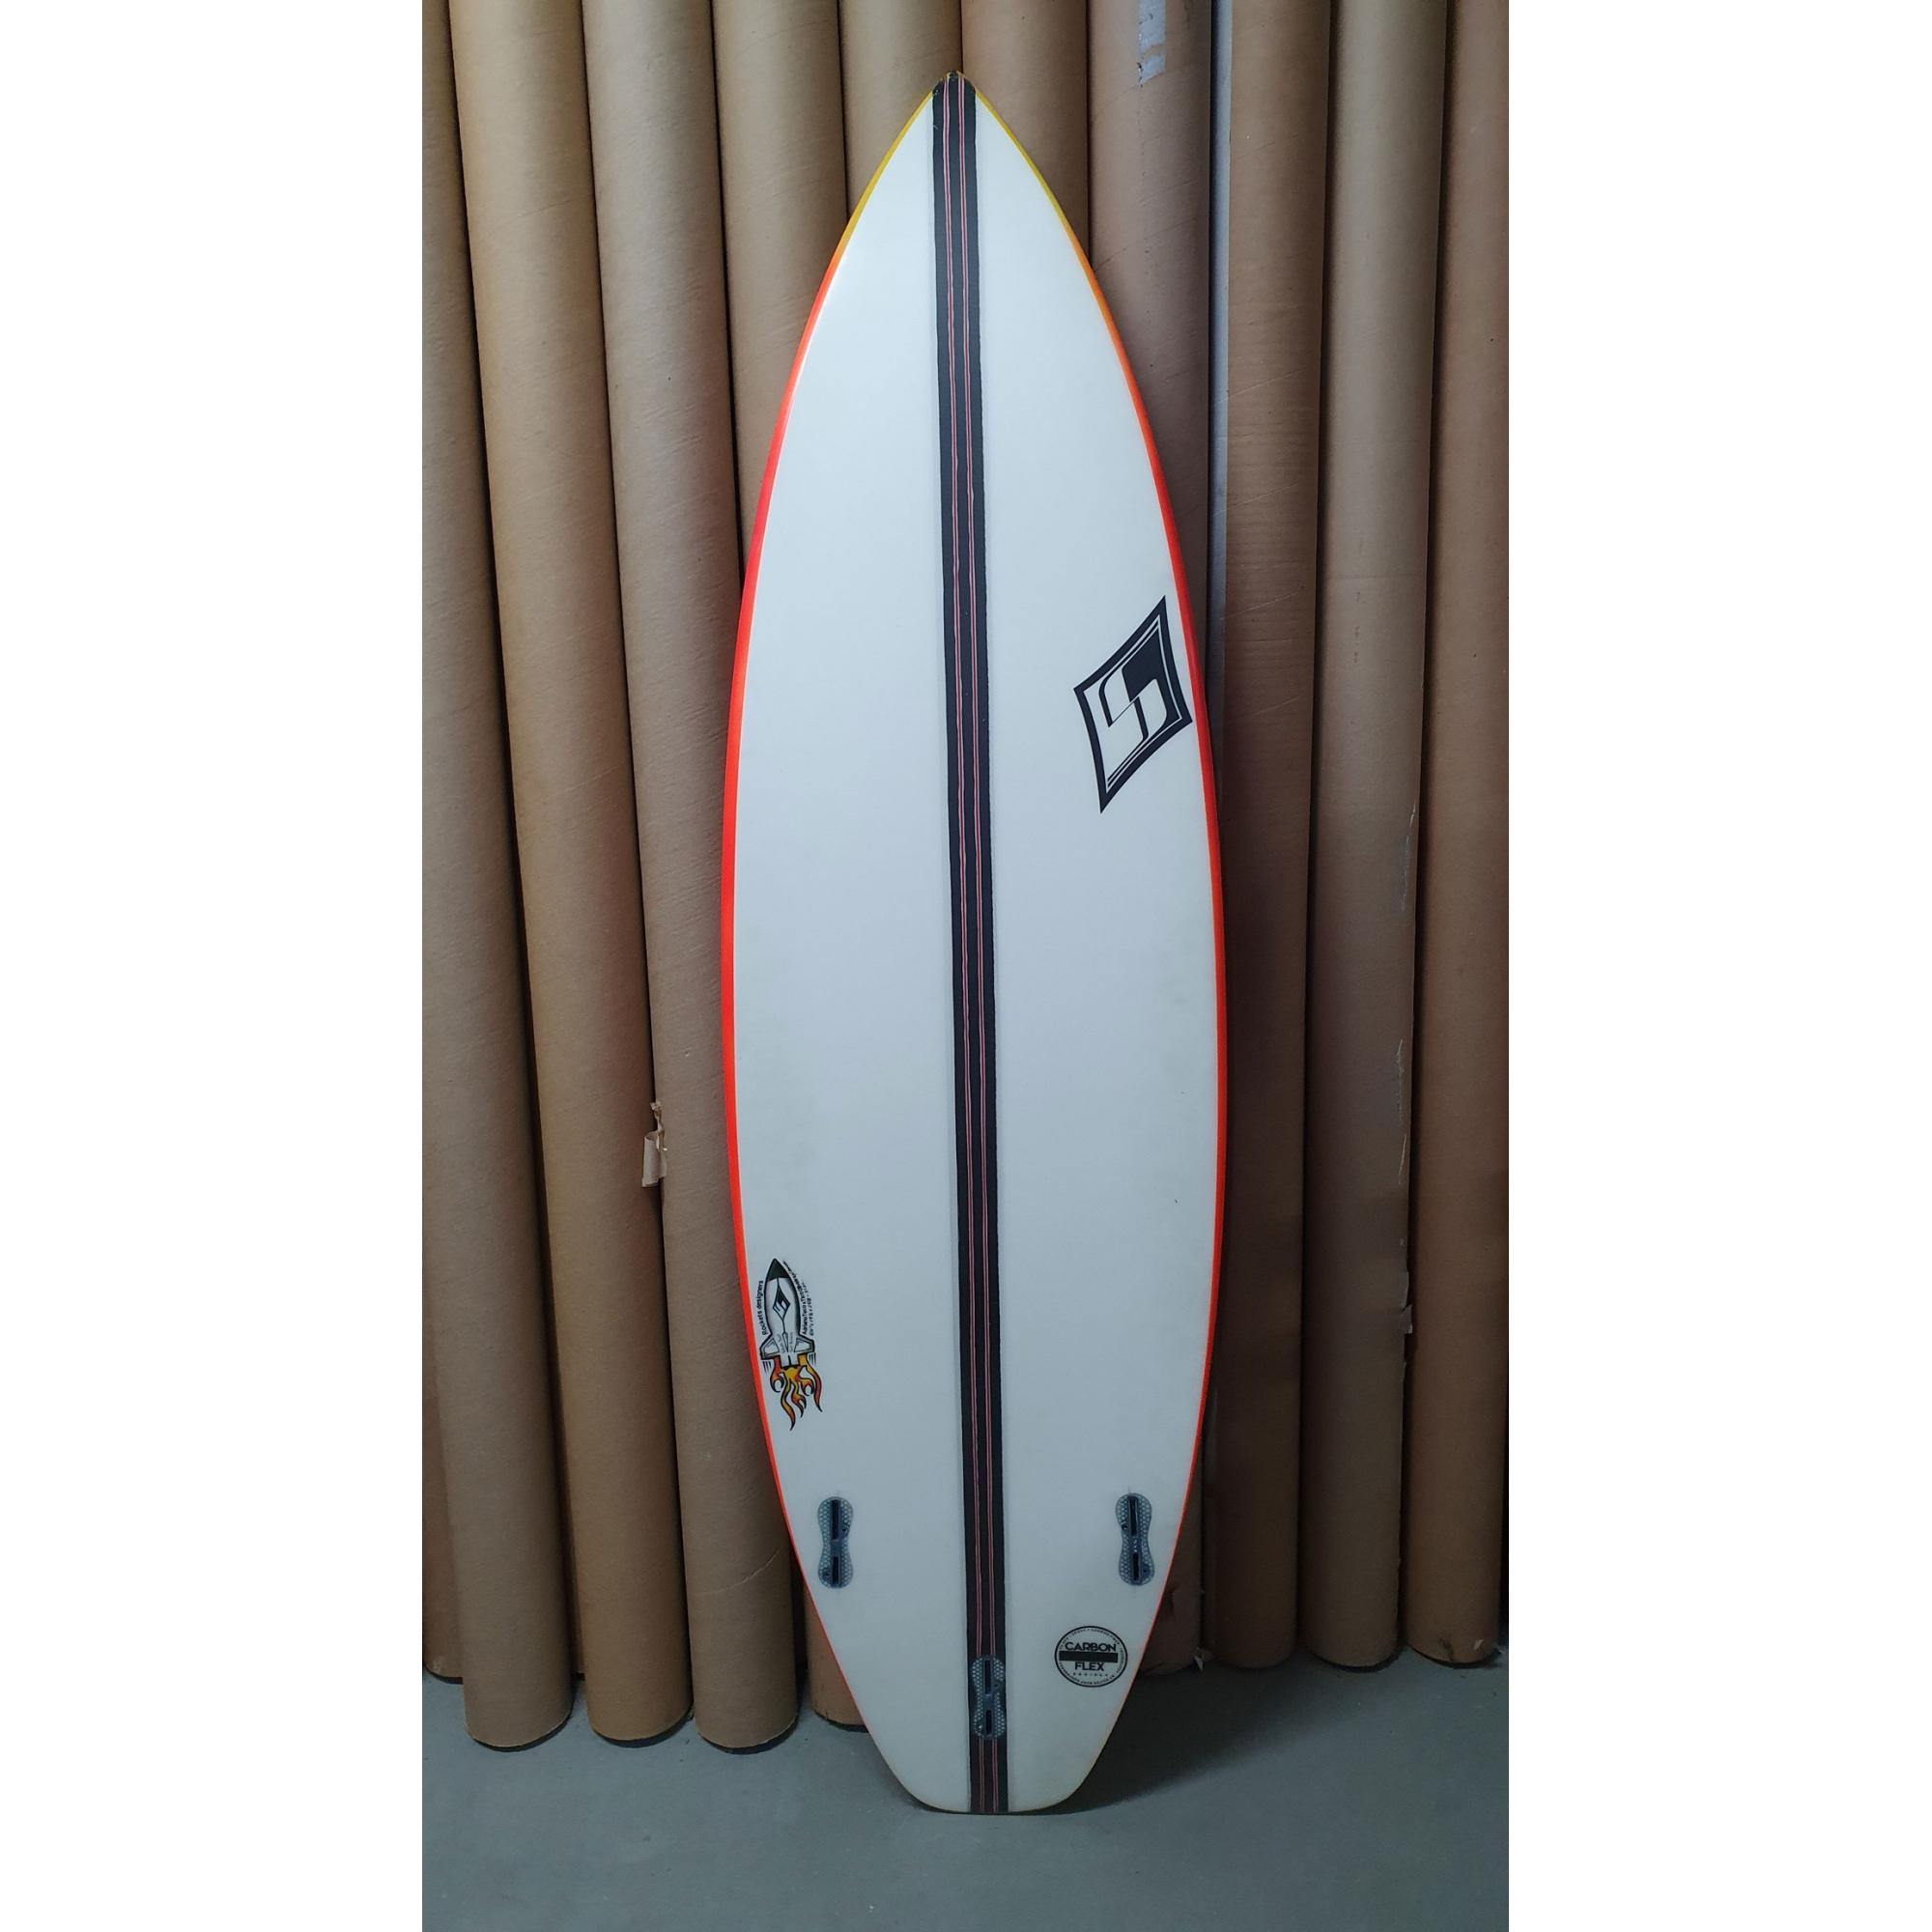 "Prancha Silver Surf 6'0"" x 19 1/2 x 2 5/8 31,2 L"